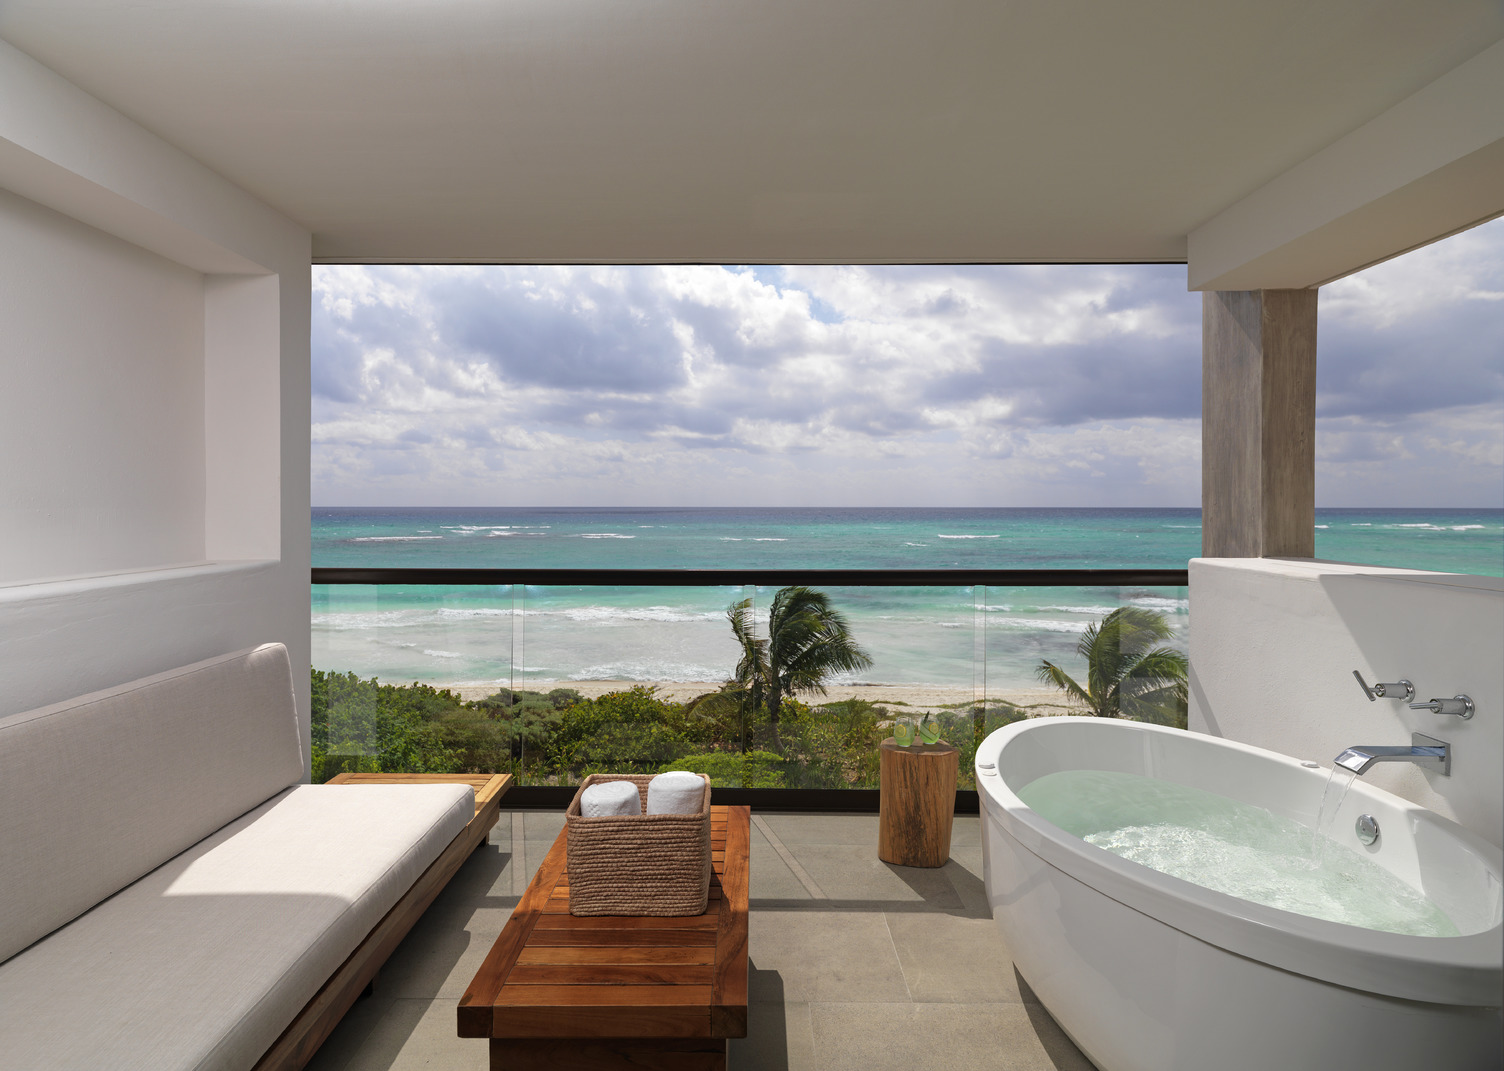 Alcoba Balcony Ocean Front Room - Image courtesy of UNICO